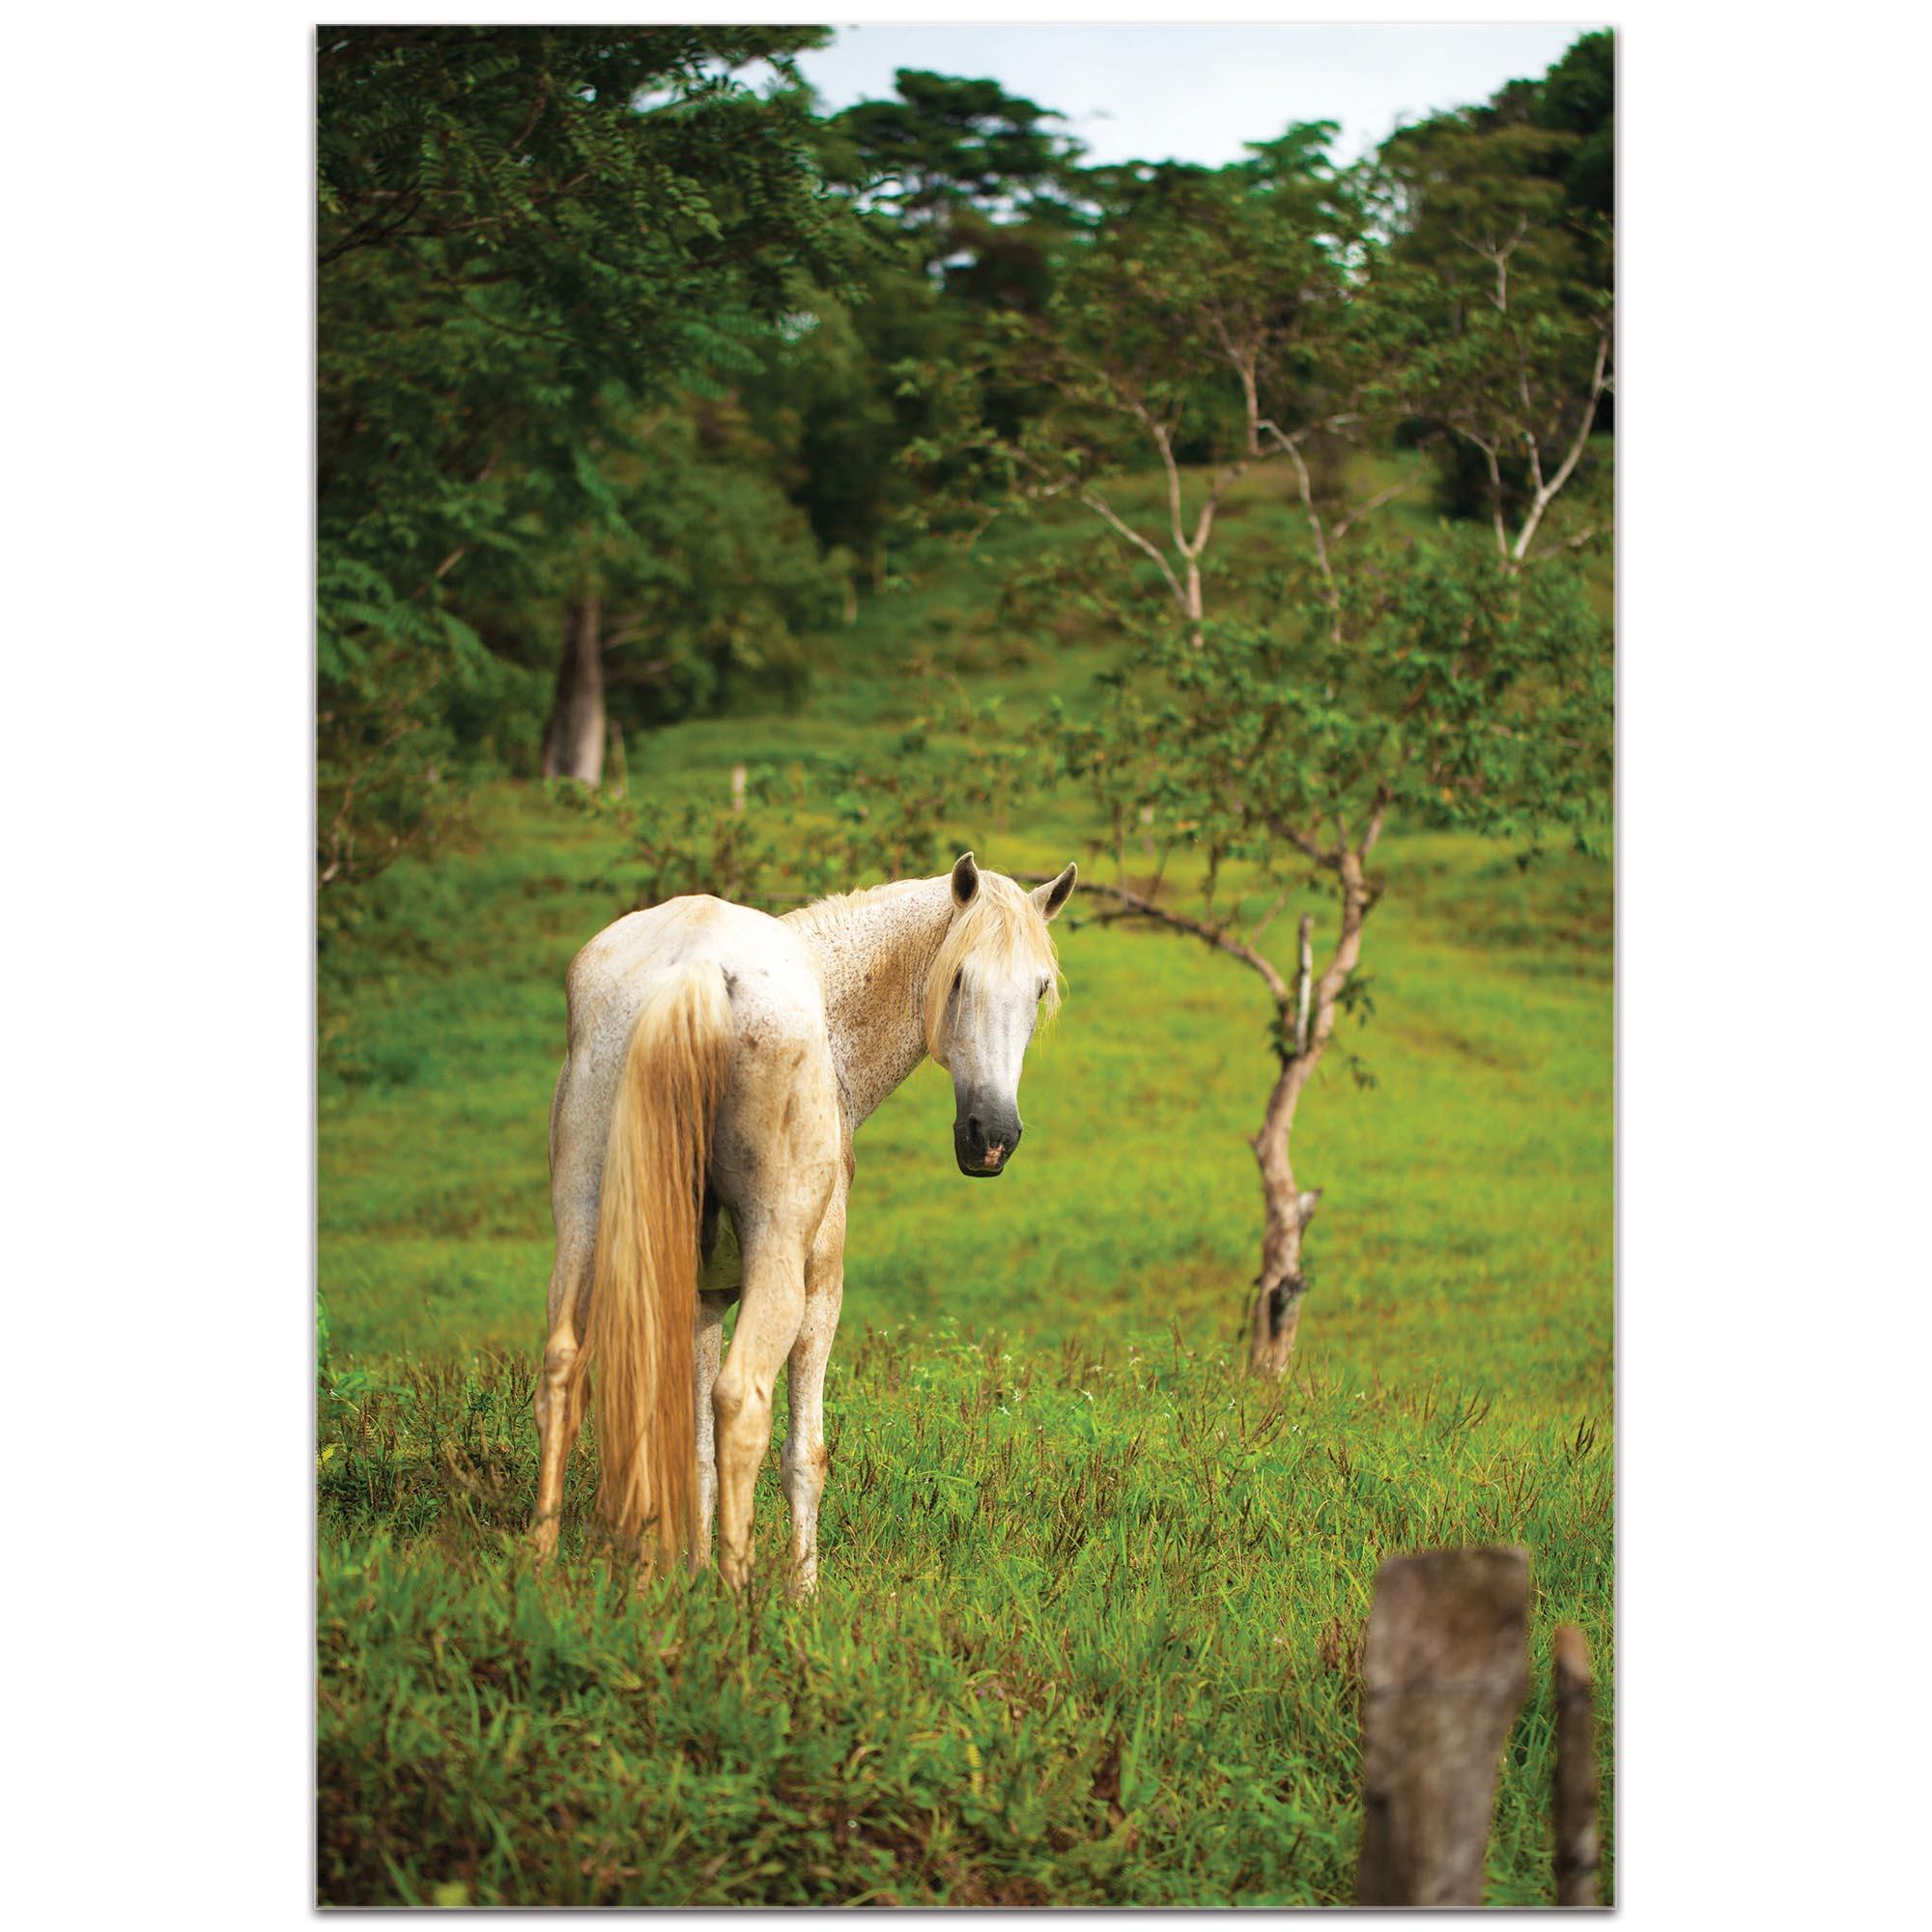 Western Wall Art 'Equine Invitation' - Horses Decor on Metal or Plexiglass - Image 2